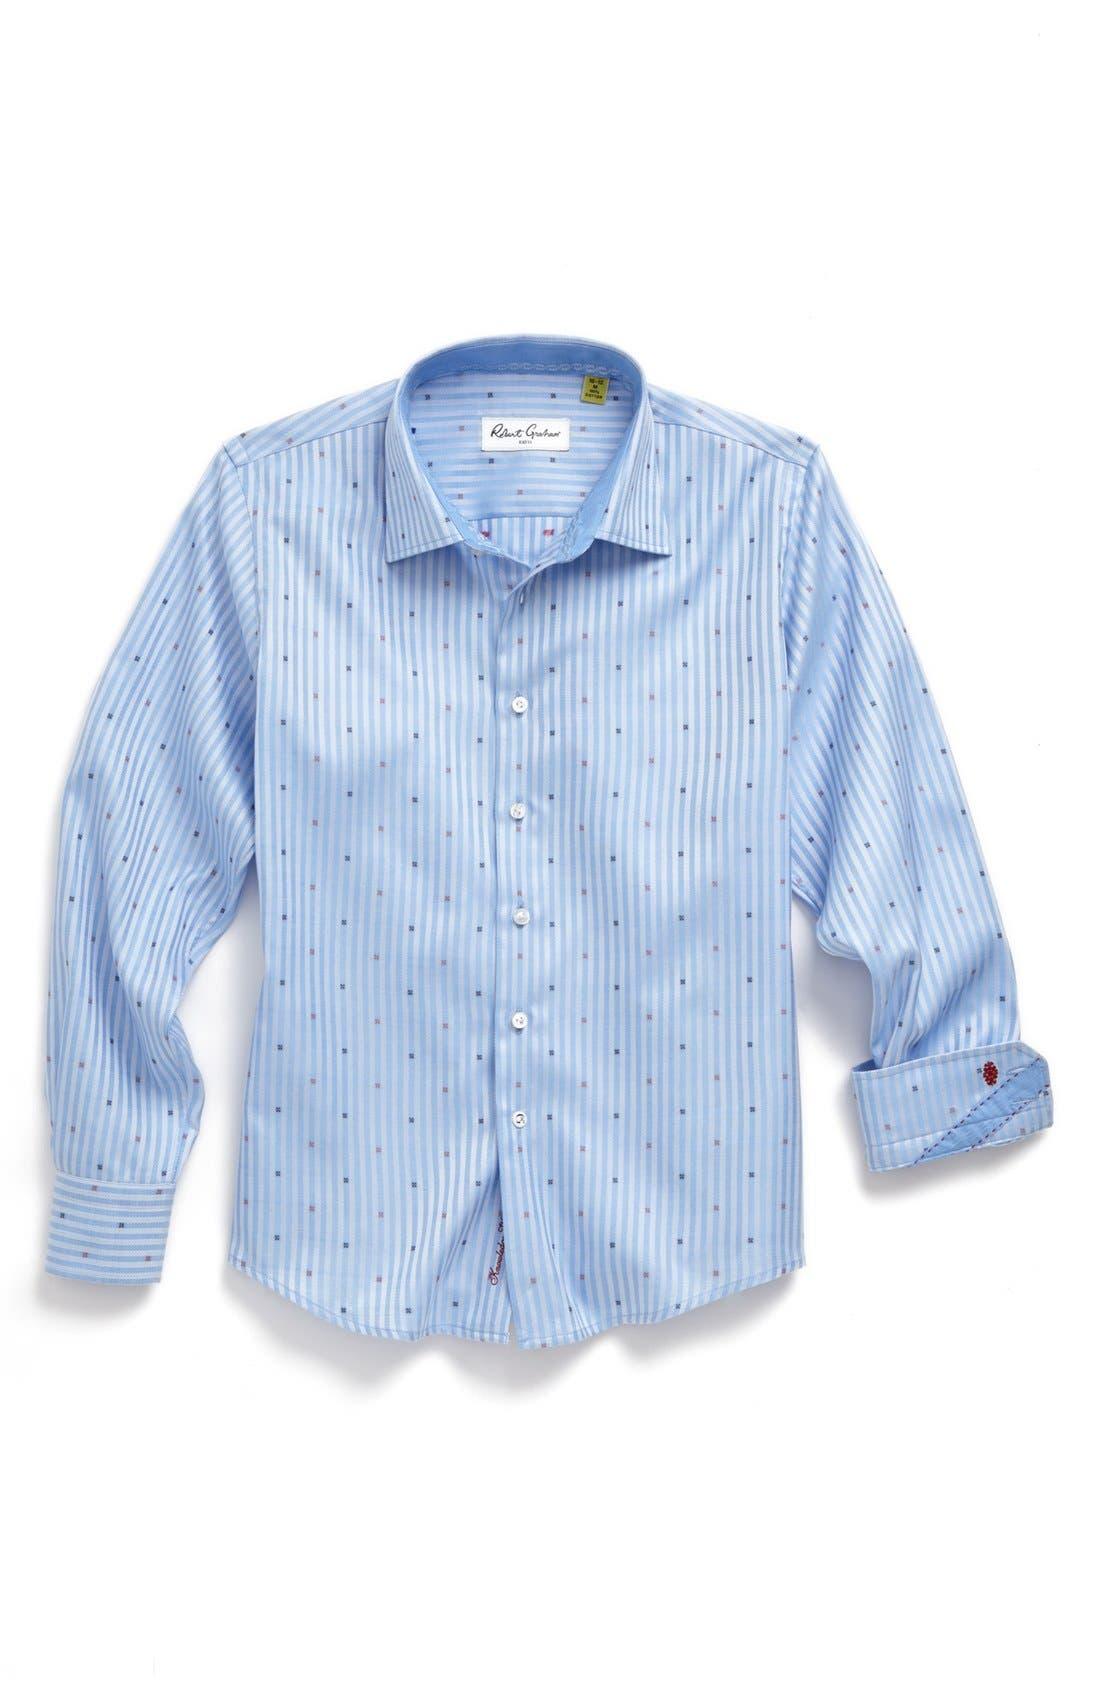 Alternate Image 1 Selected - Robert Graham Stripe Dress Shirt (Big Boys)